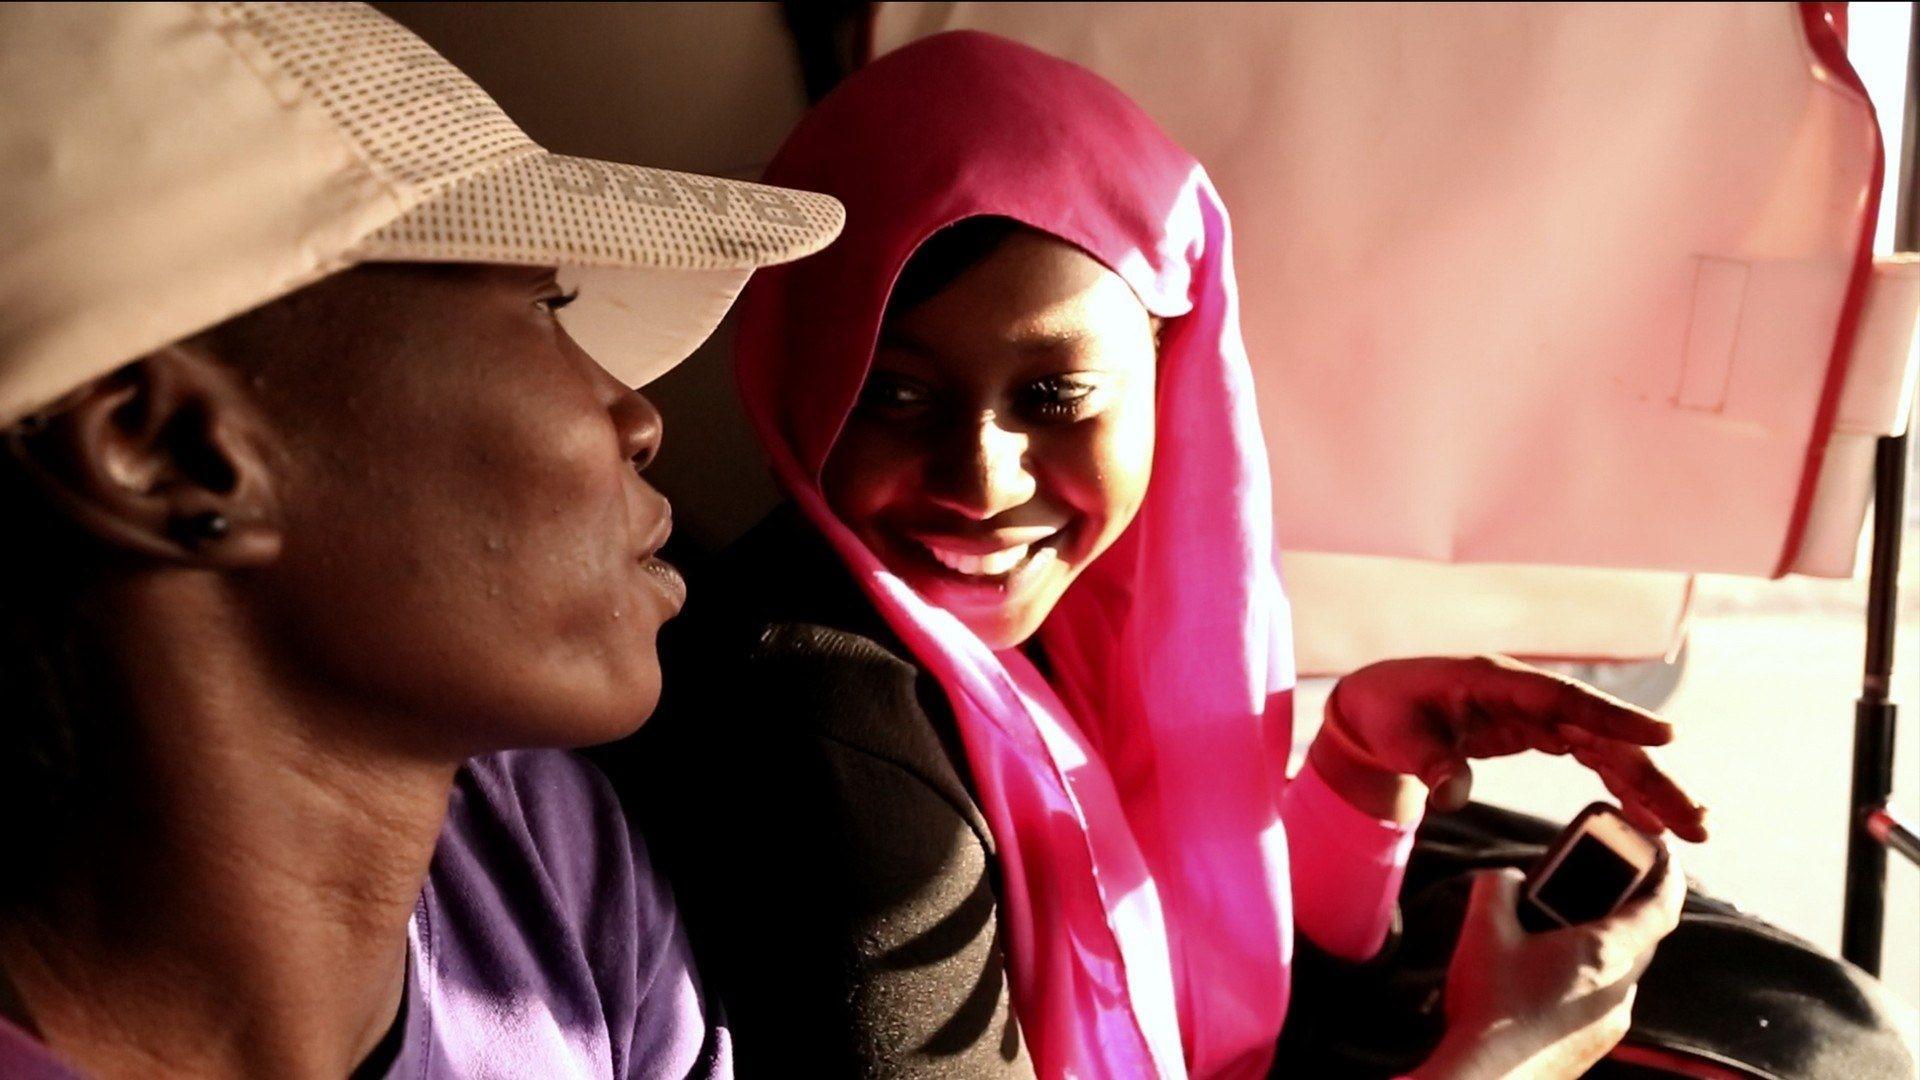 Still from the film Khartoum Offside